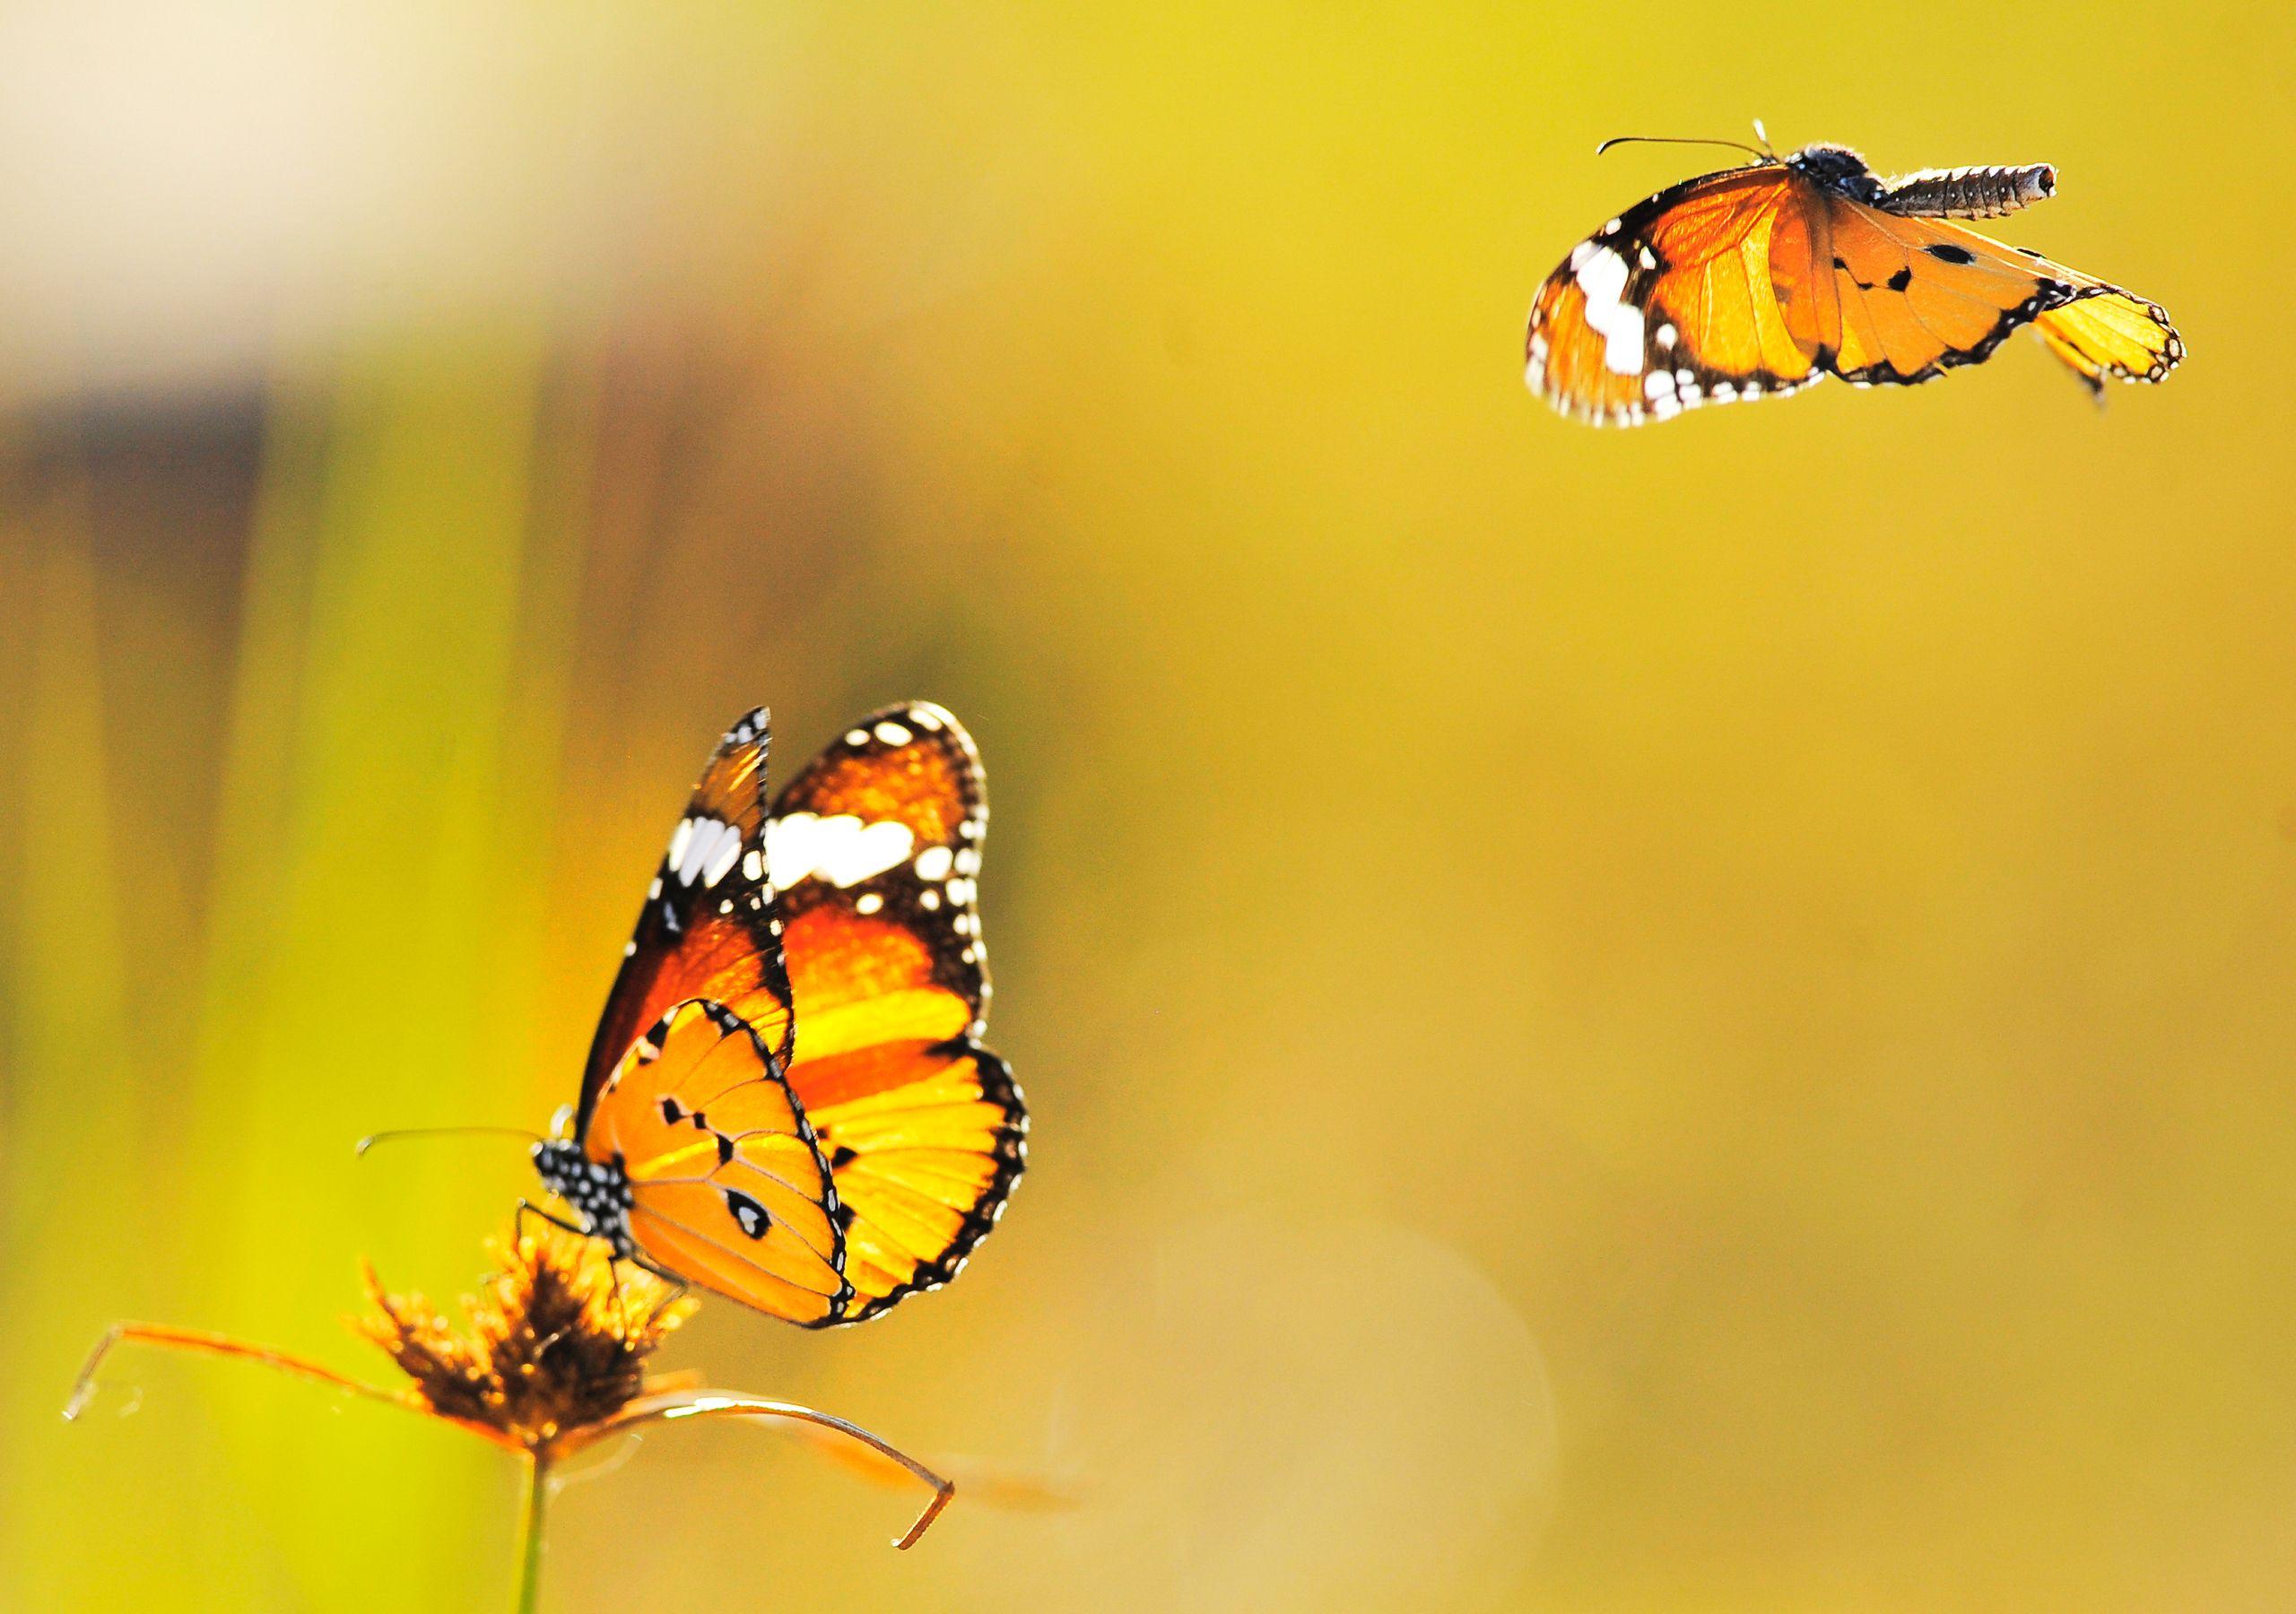 1571 Yellow Butterfly Background Hd Wallpaper Butterfly